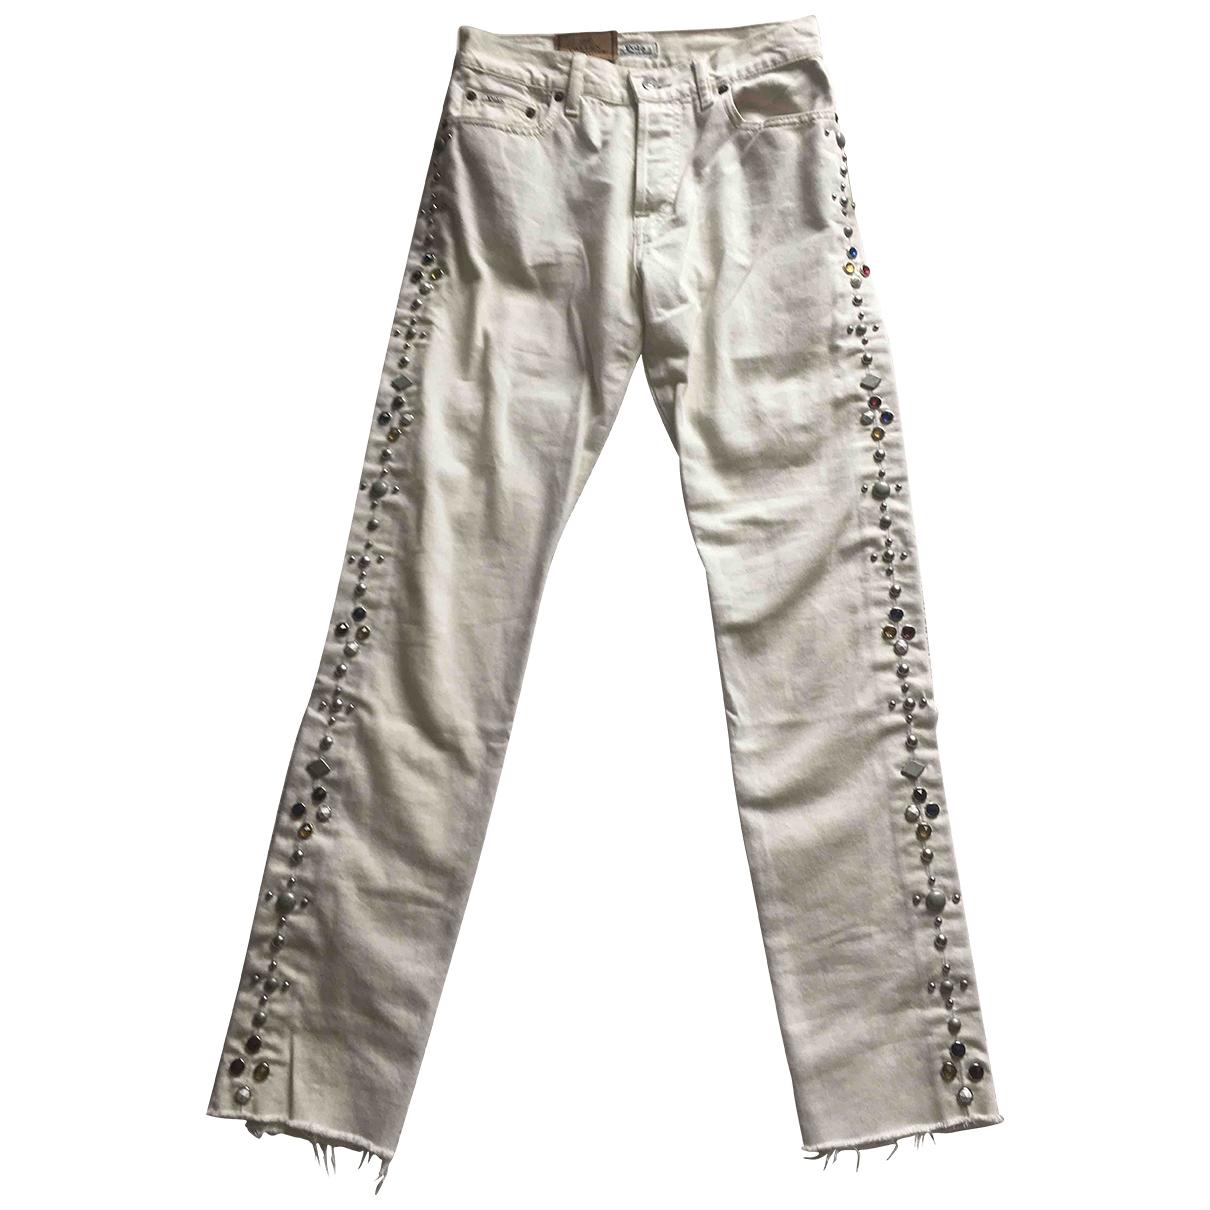 Polo Ralph Lauren \N White Denim - Jeans Trousers for Women XS International